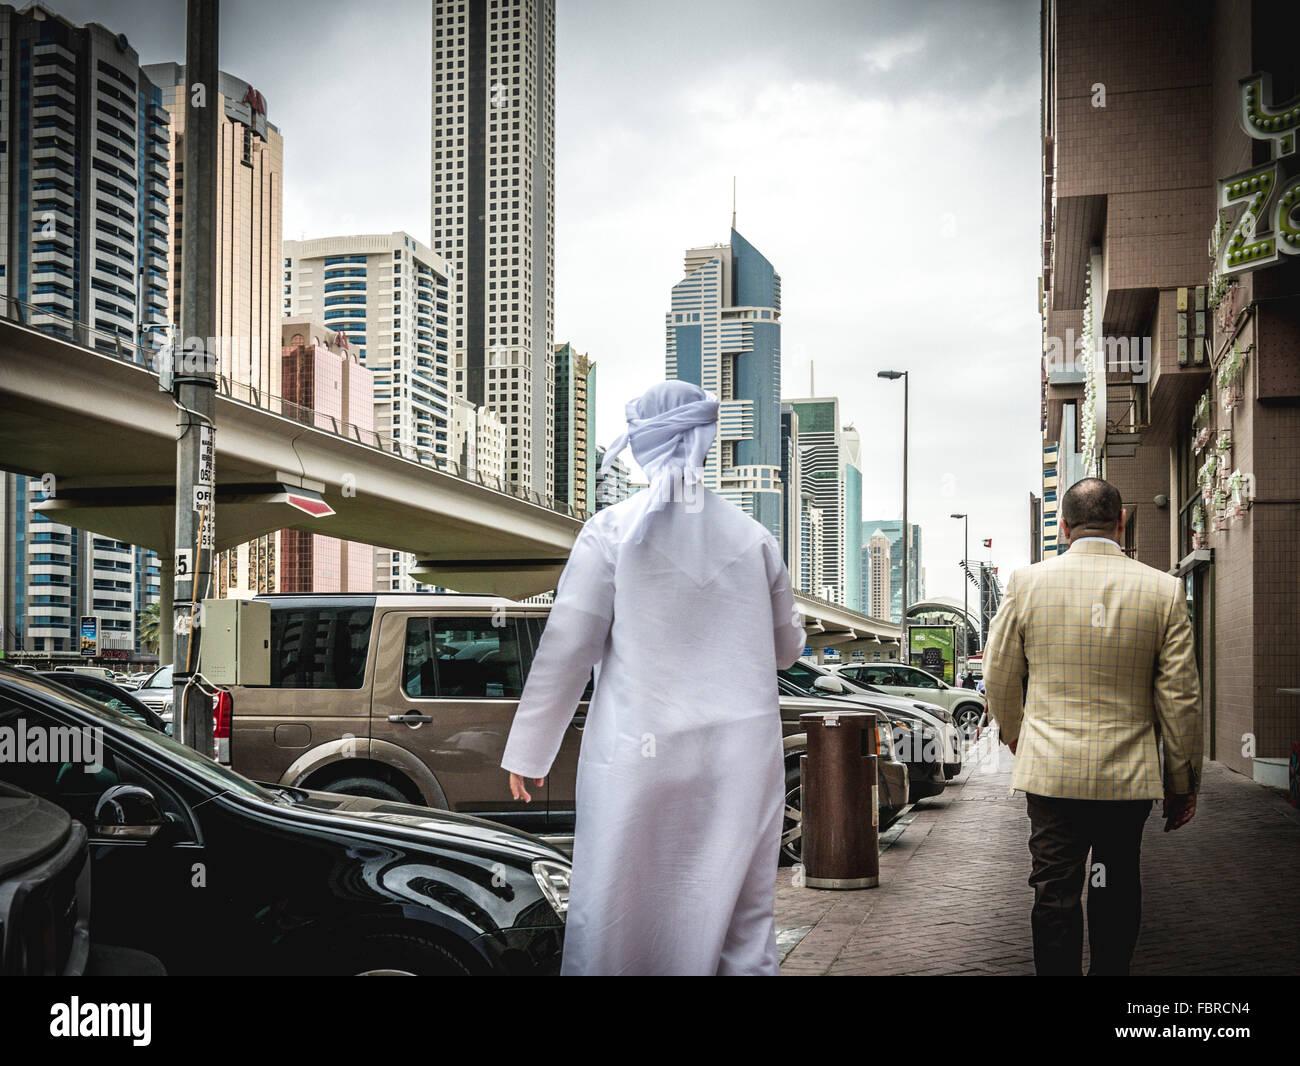 Hombre árabe ocupado caminando a lo largo de Sheik Zayed Road Imagen De Stock